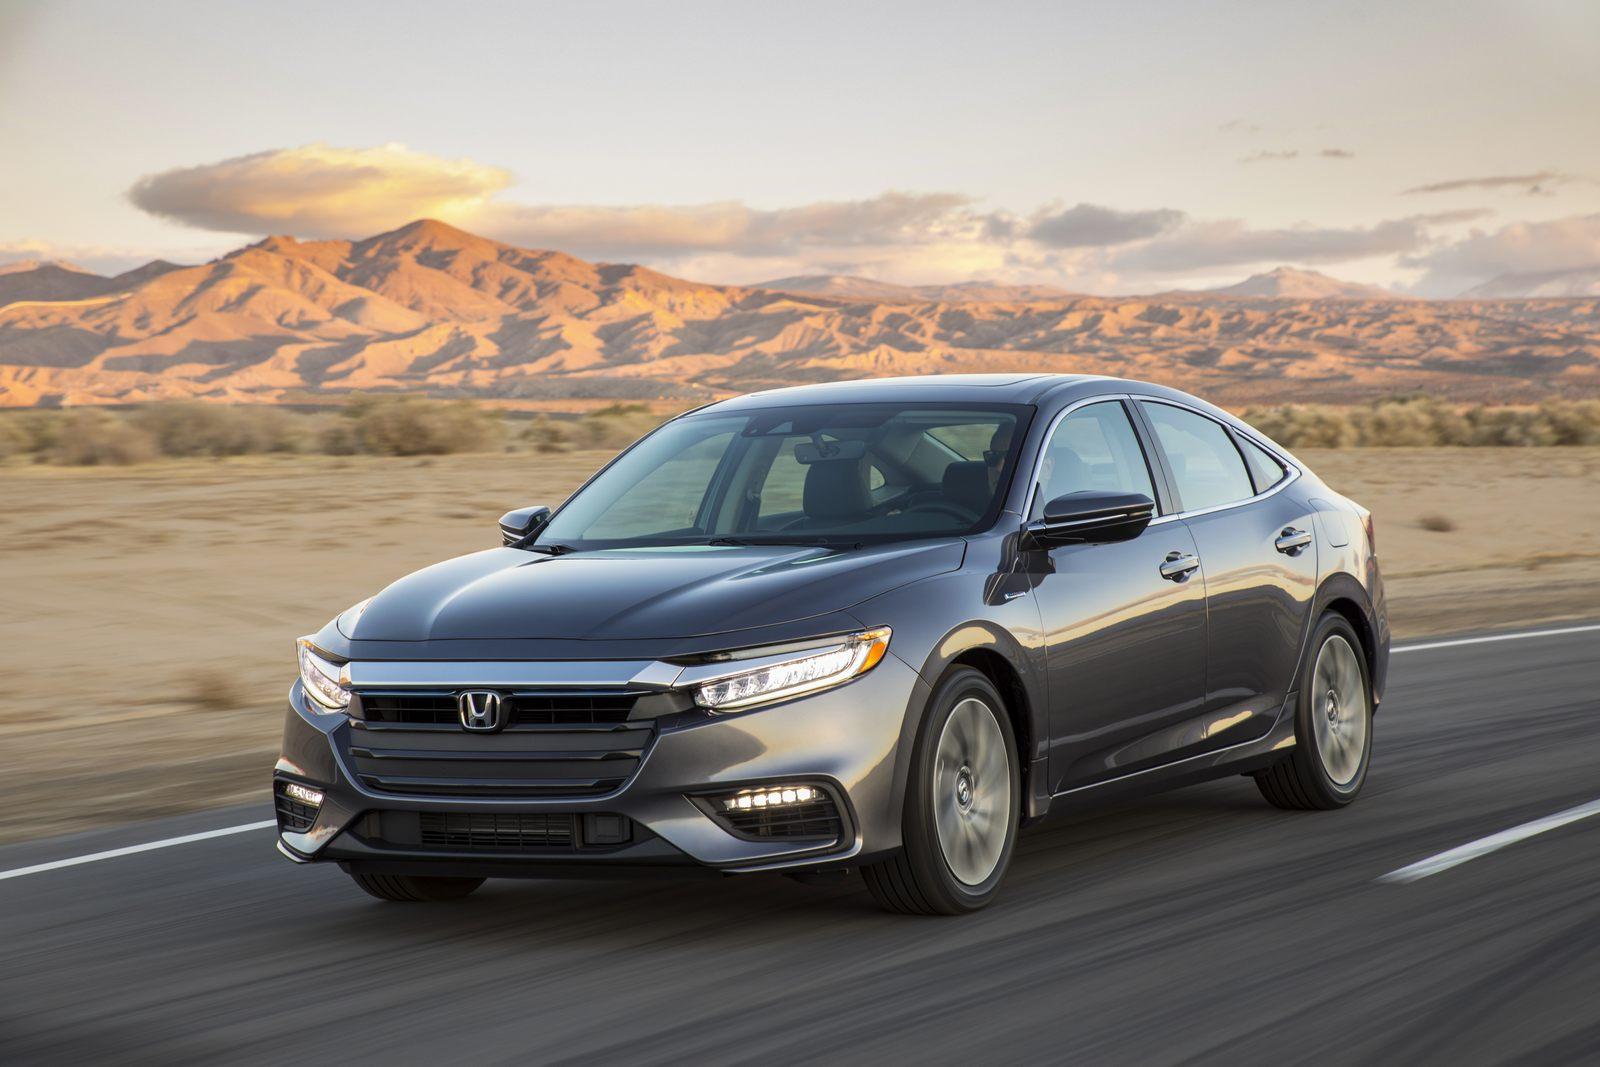 Honda Unveils The 2019 Insight Its New Upscale Hybrid Sedan